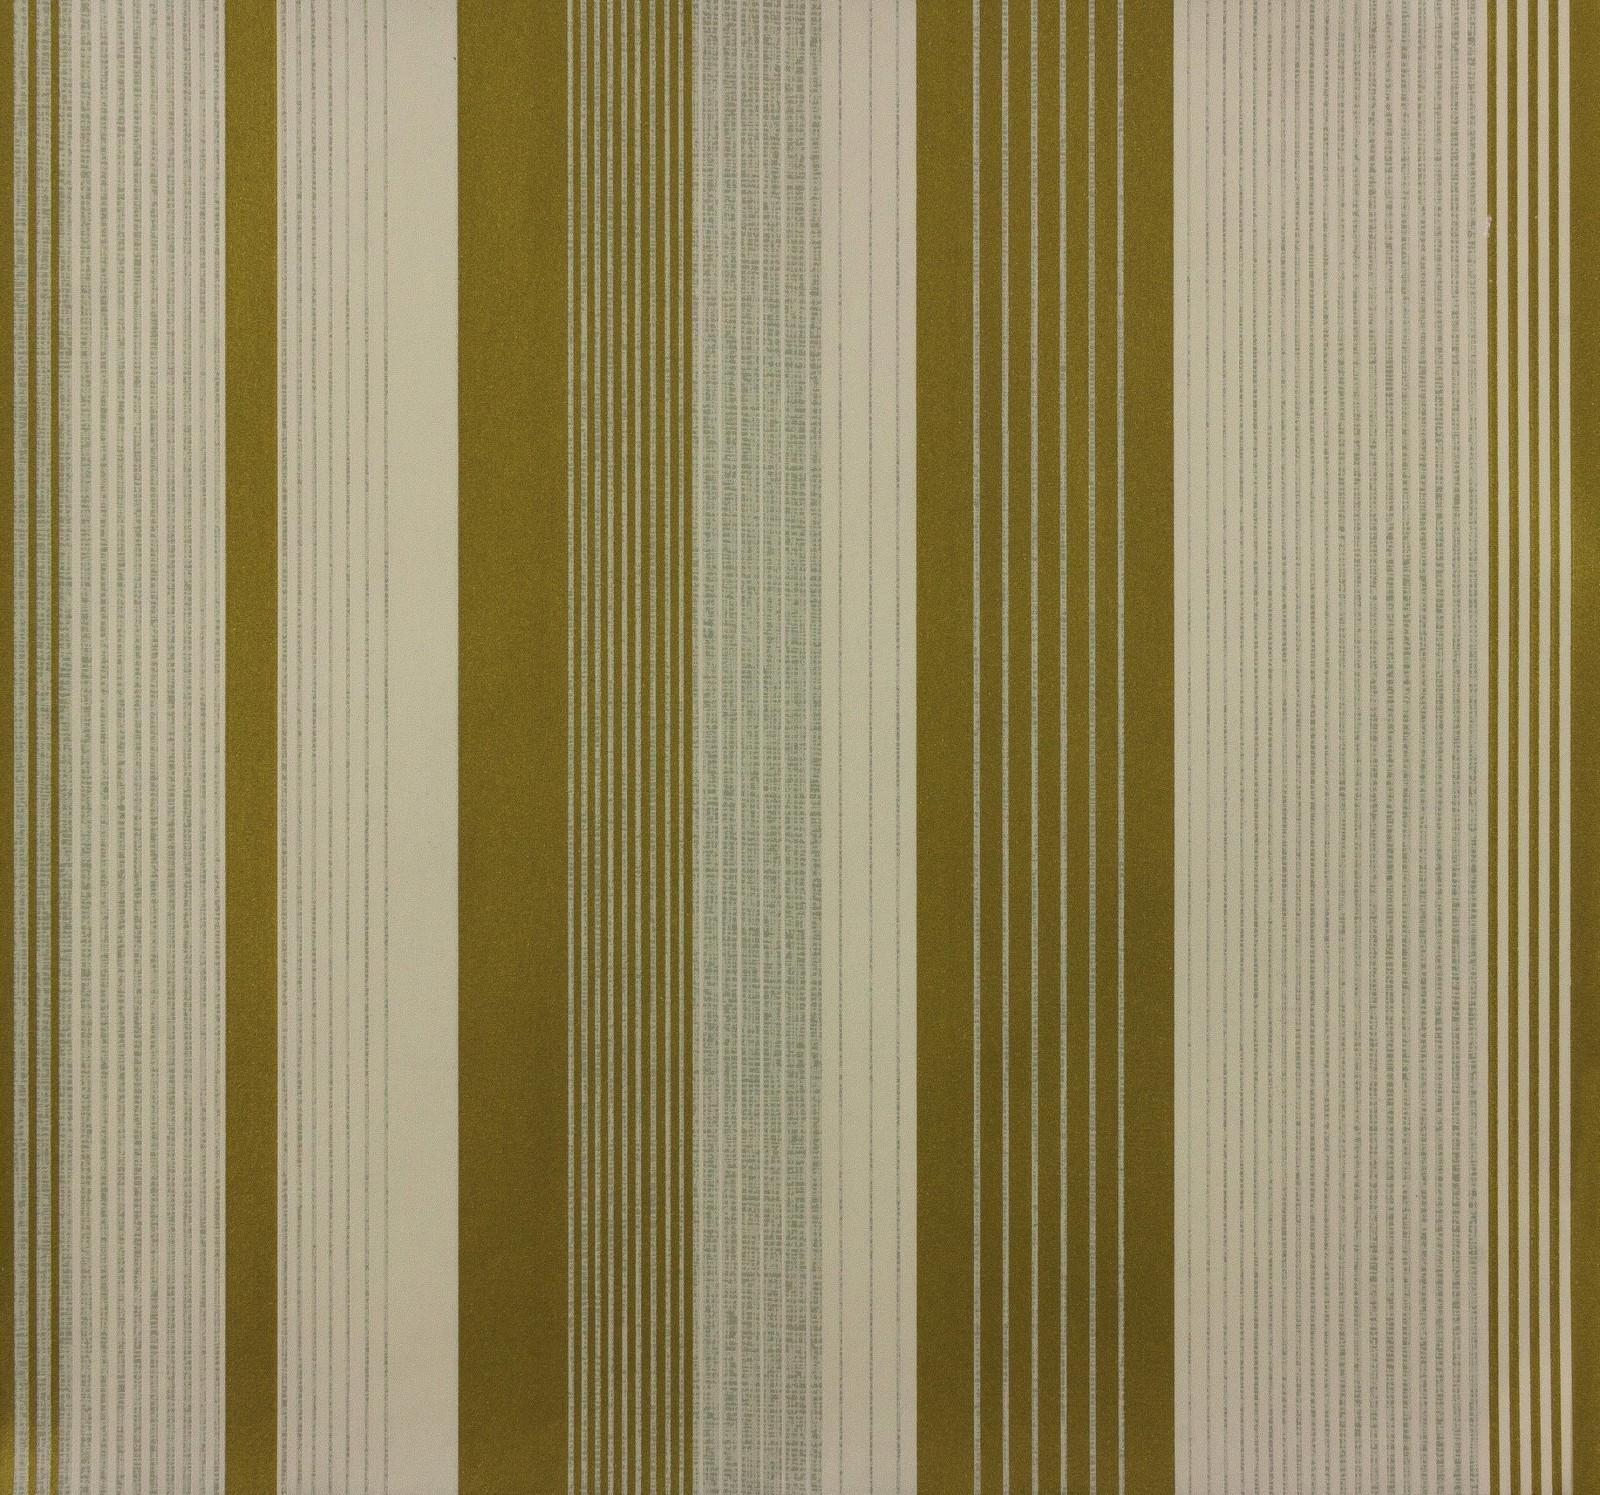 Jette Joop Tapete Streifen : Marburg Wallpaper Astoria non-woven wallpaper 53705 stripes greygreen